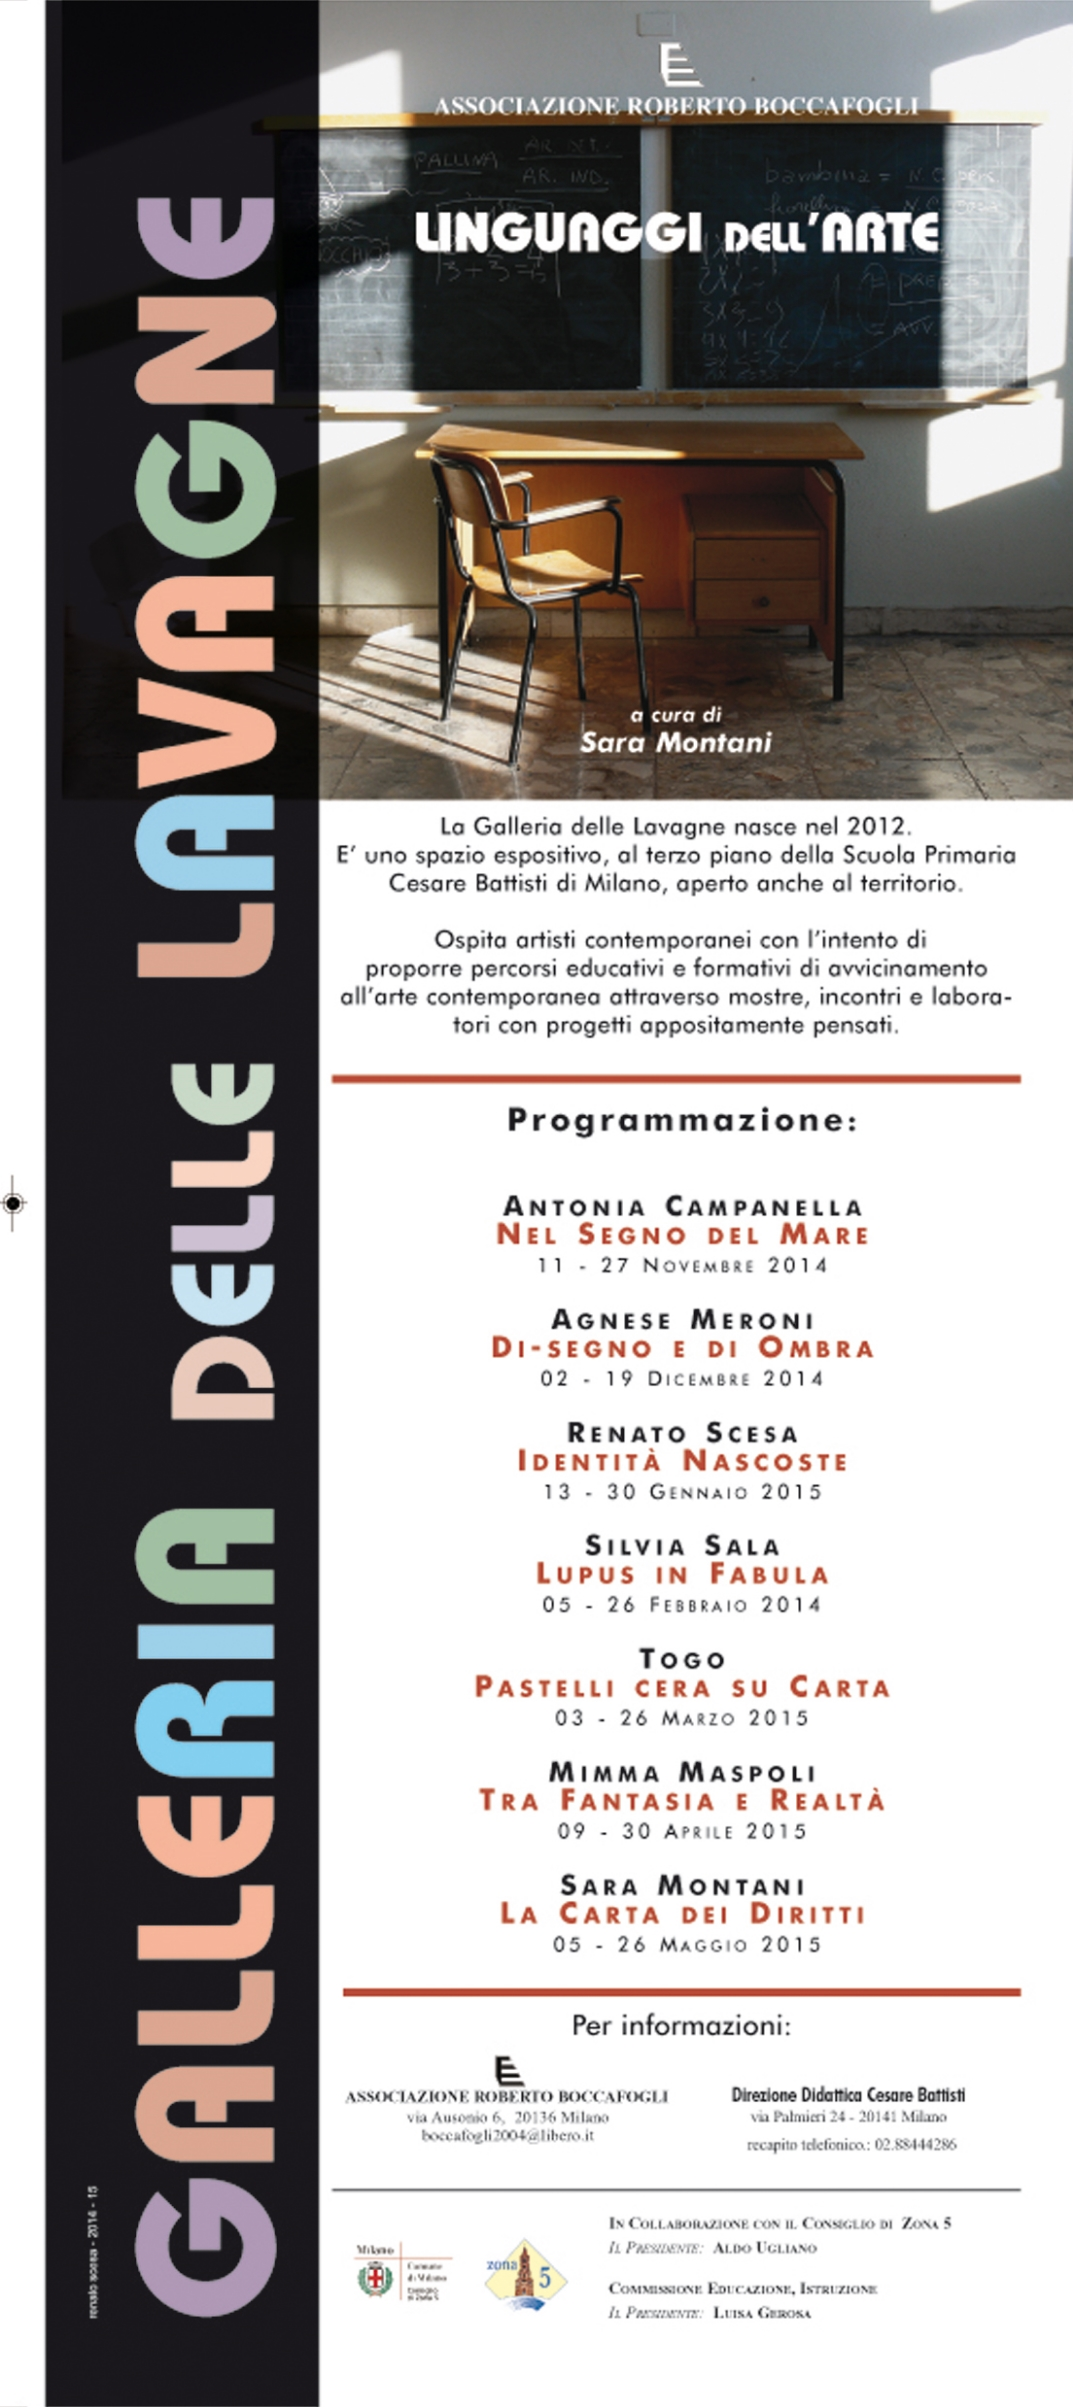 galleria-delle-lavagne-2014-locandina.jpg